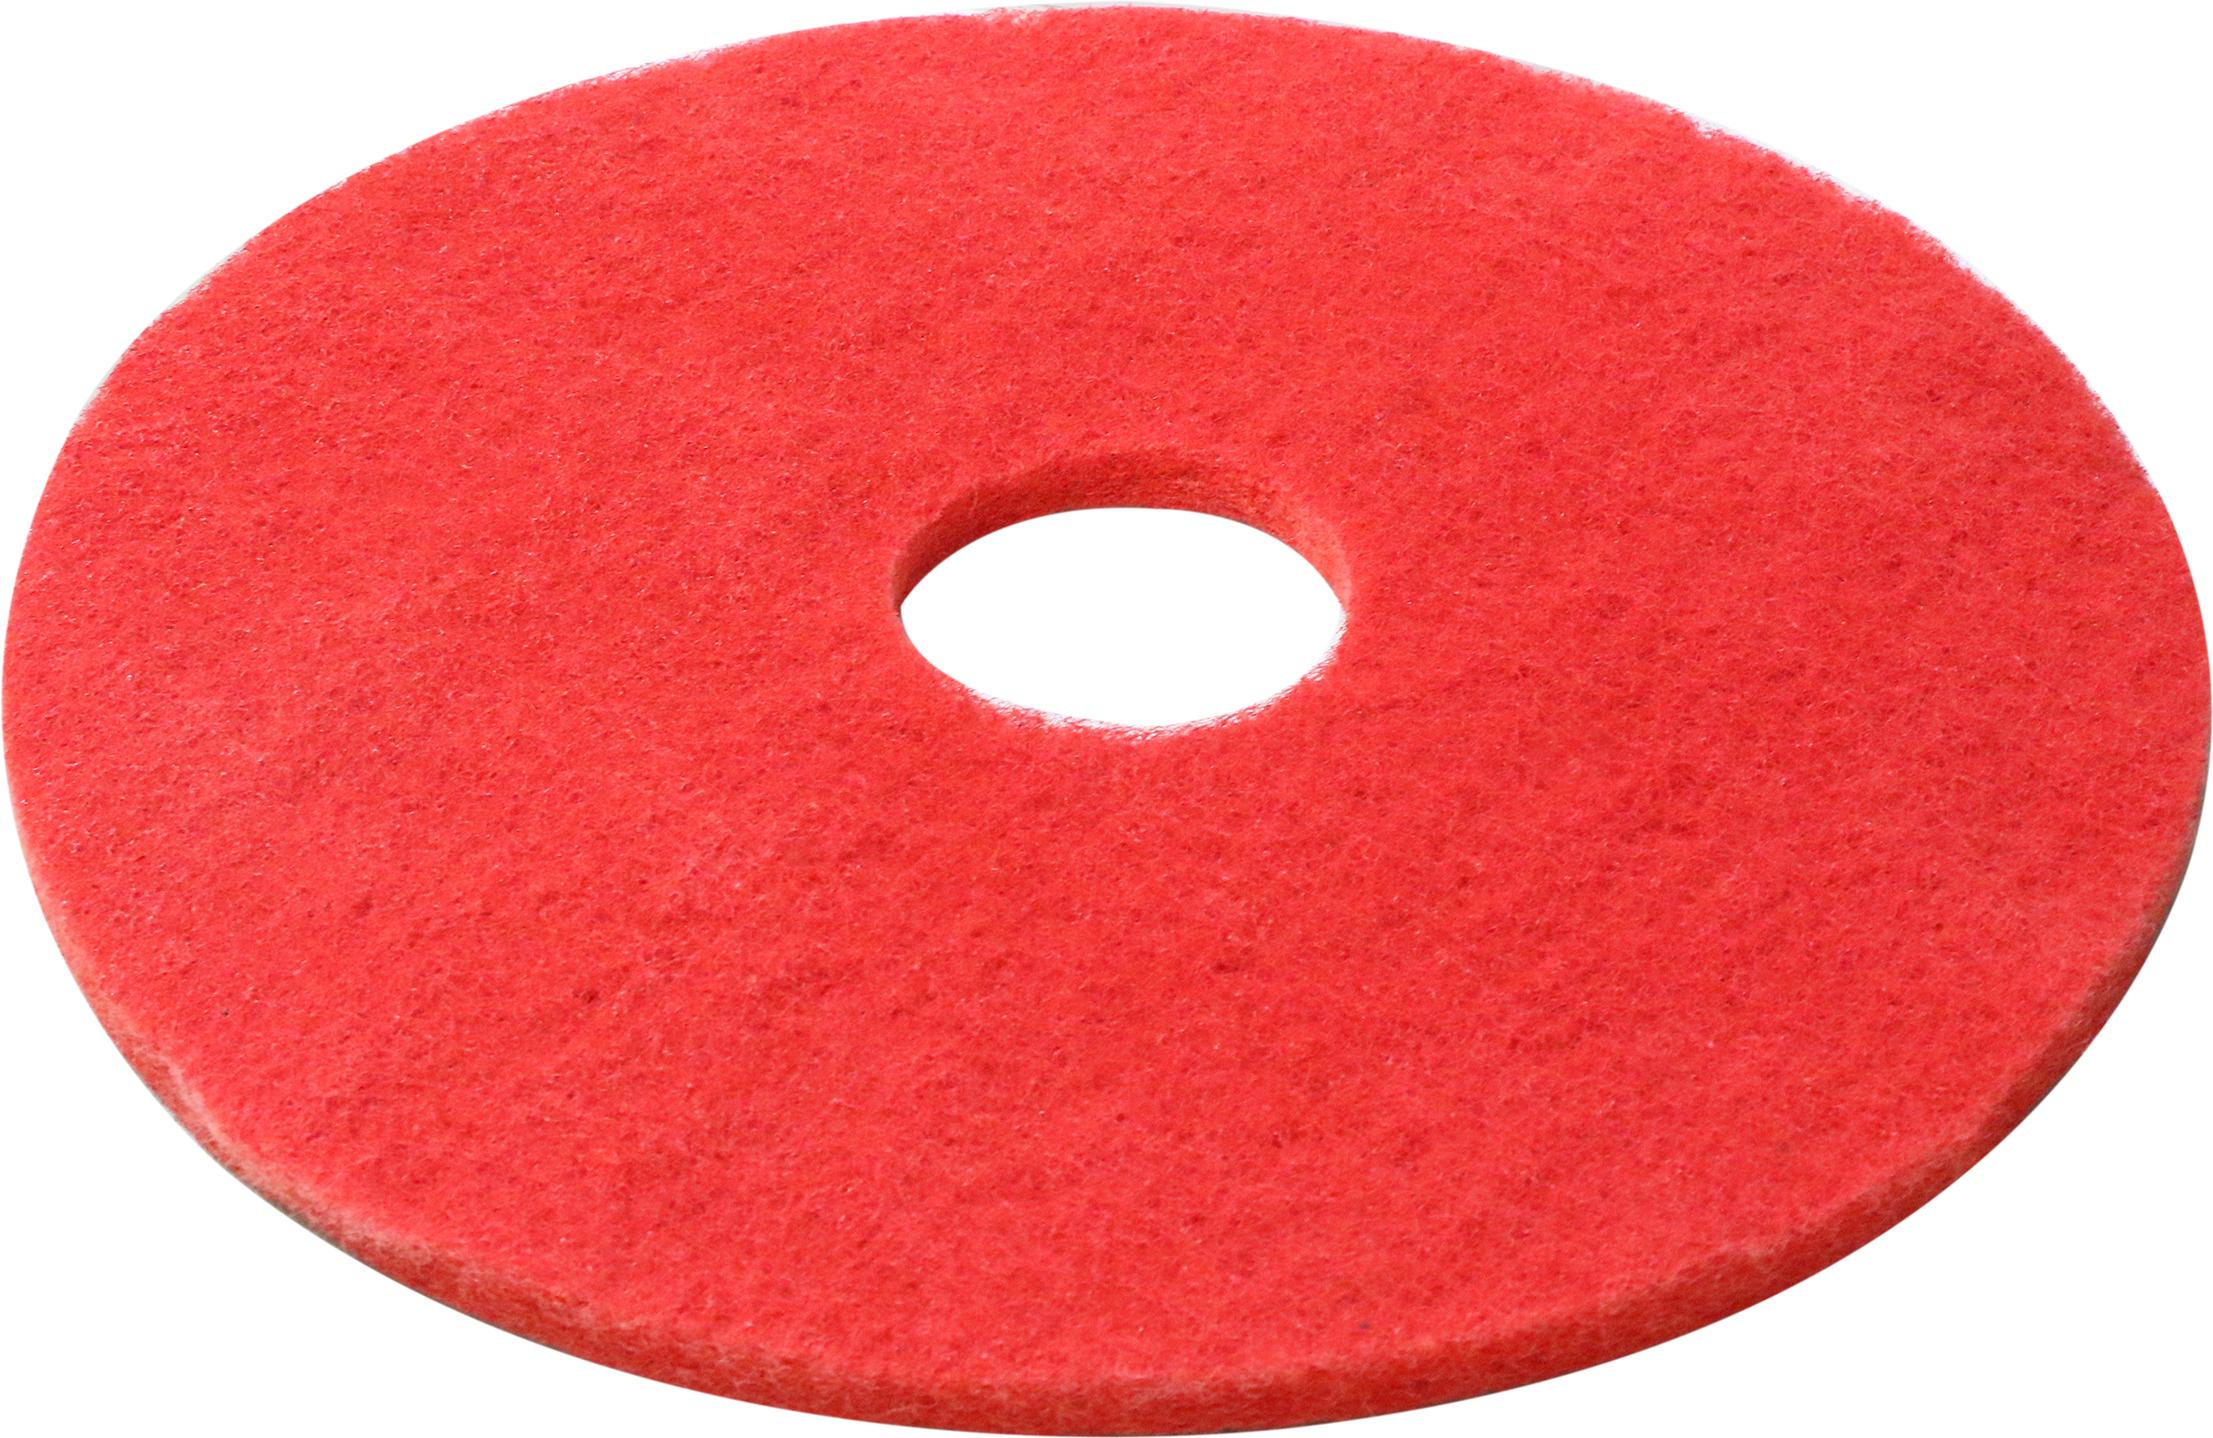 Floor Cleaning Pad